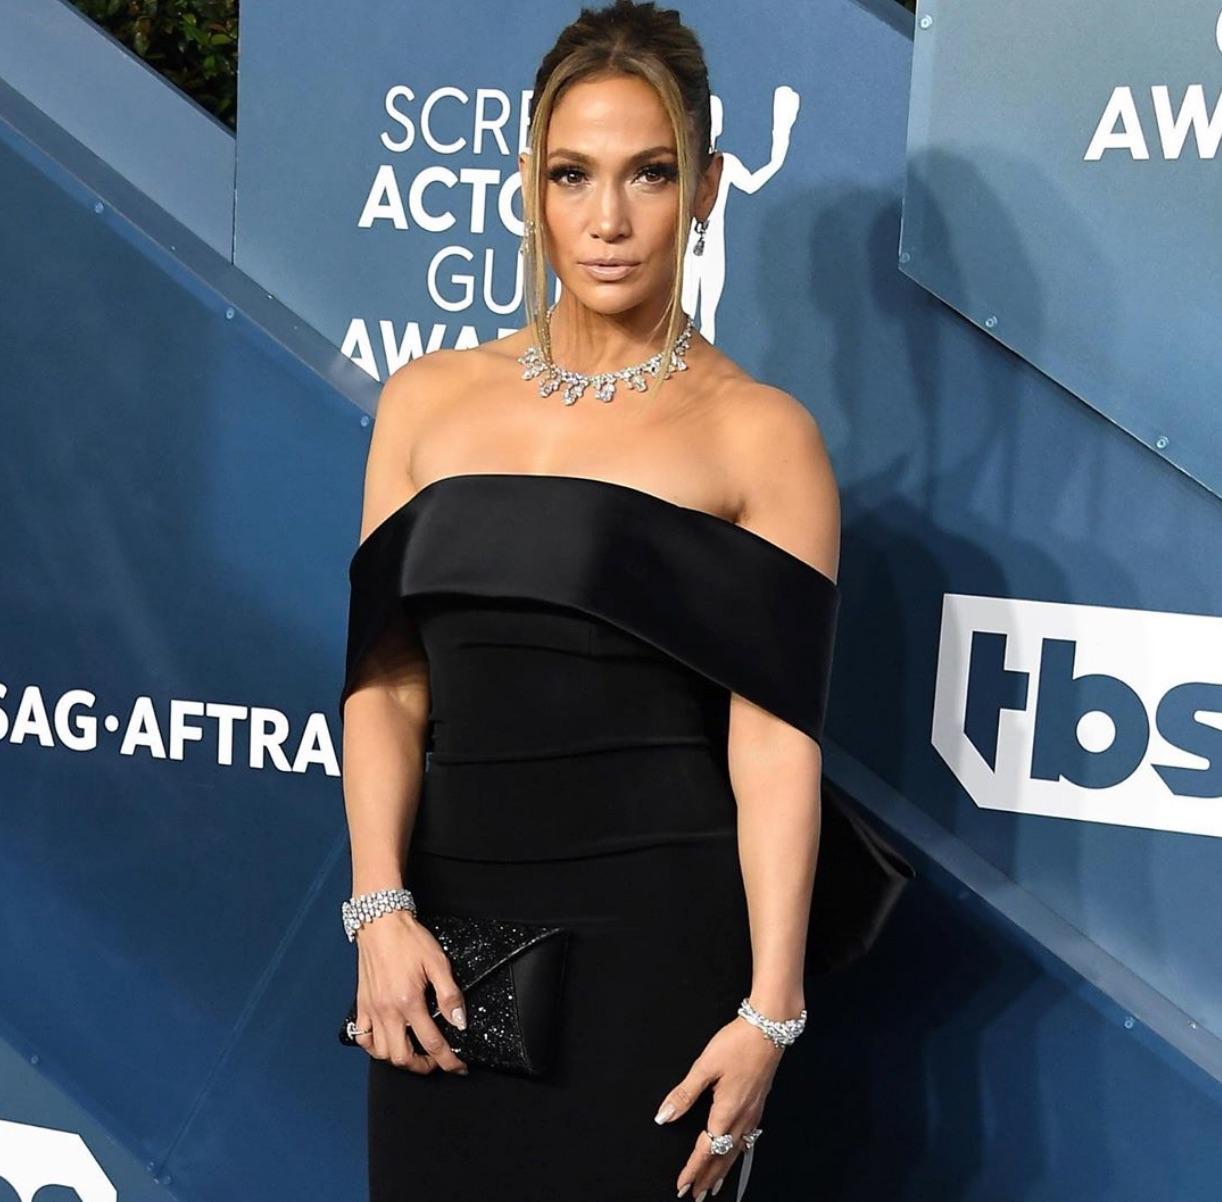 Jennifer Lopez wore $9-million worth of diamond jewelry from Harry Winston